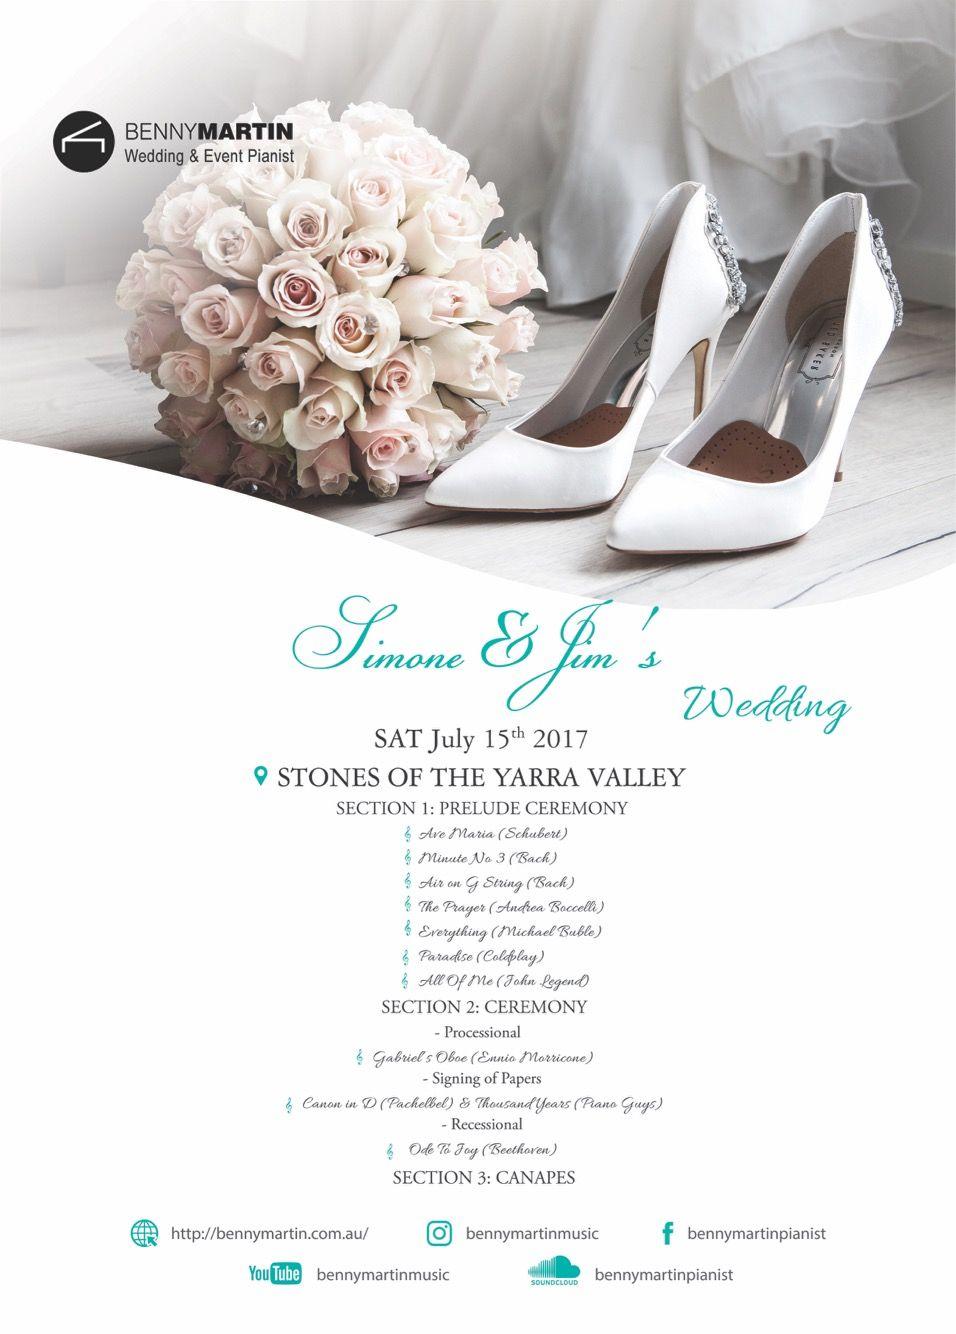 Wedding ceremony set list